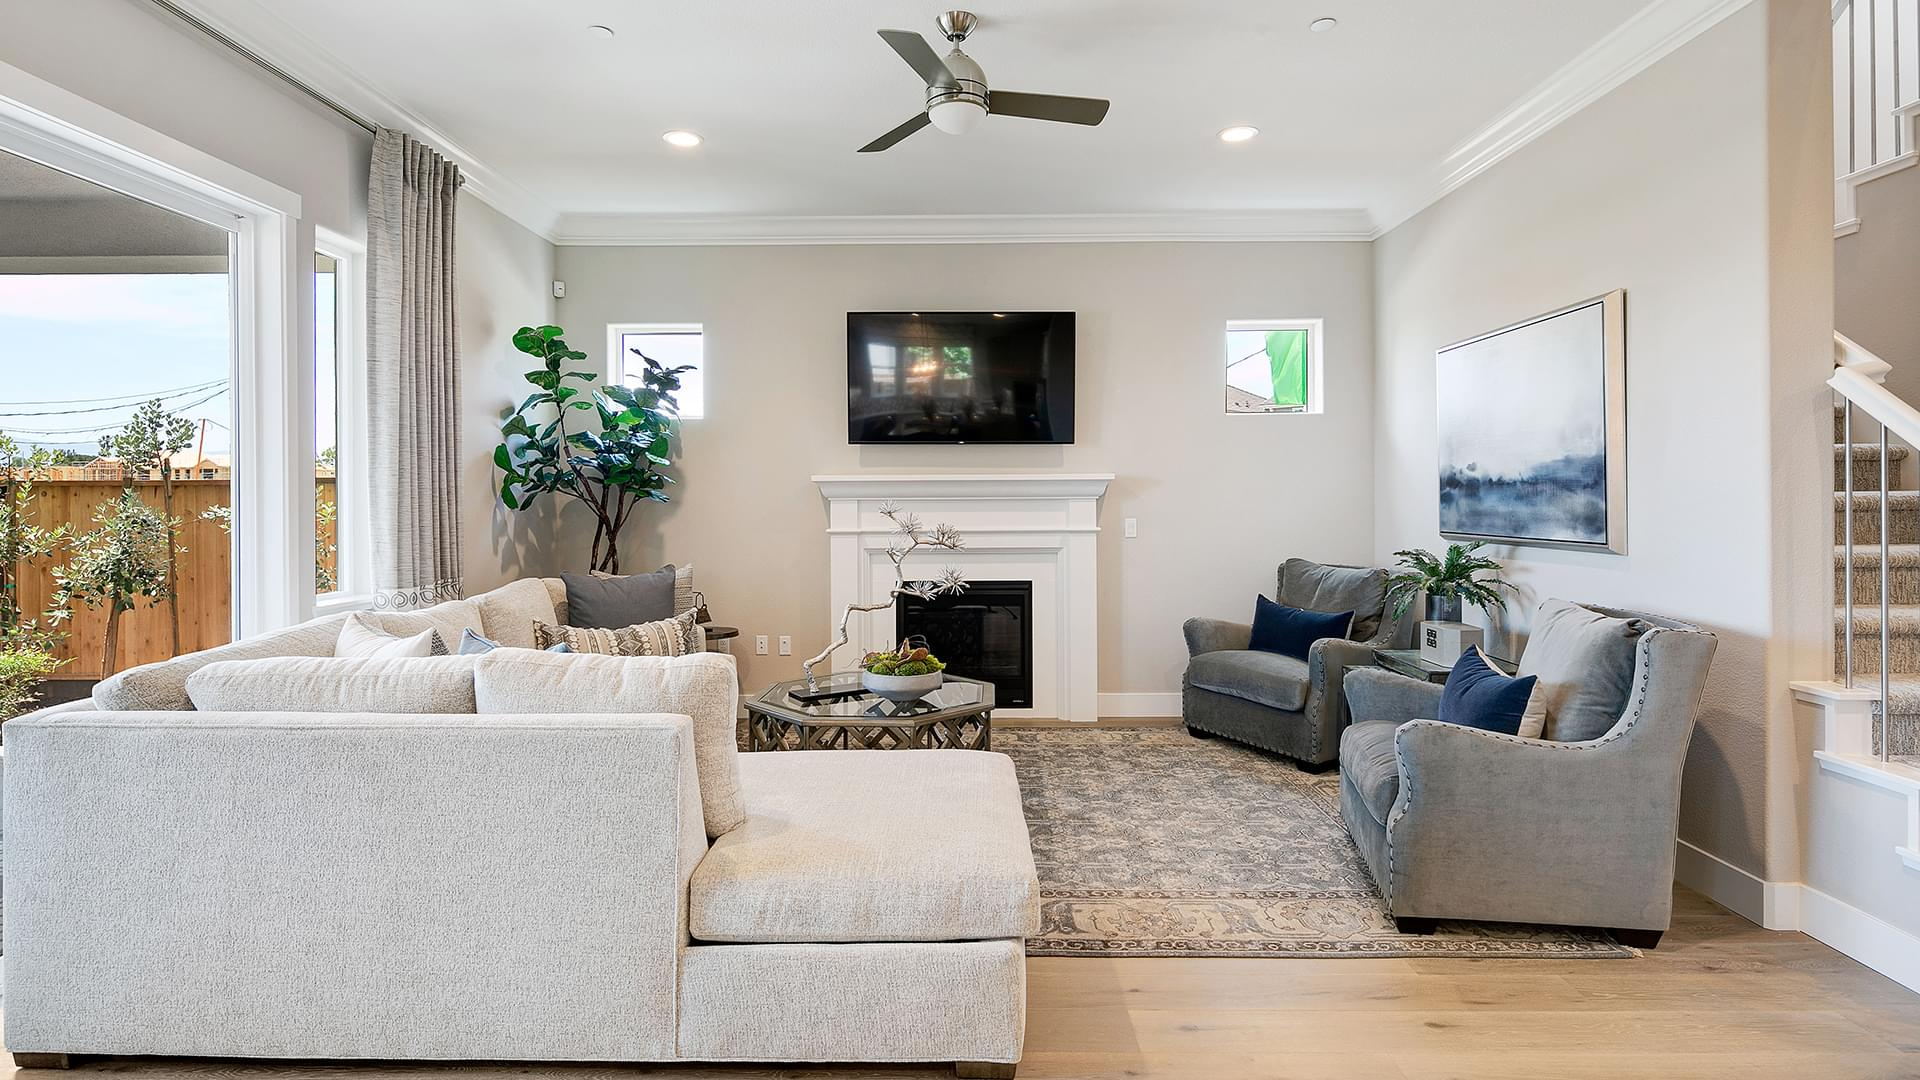 2306 Mirth Street in San Jose, CA by DeNova Homes